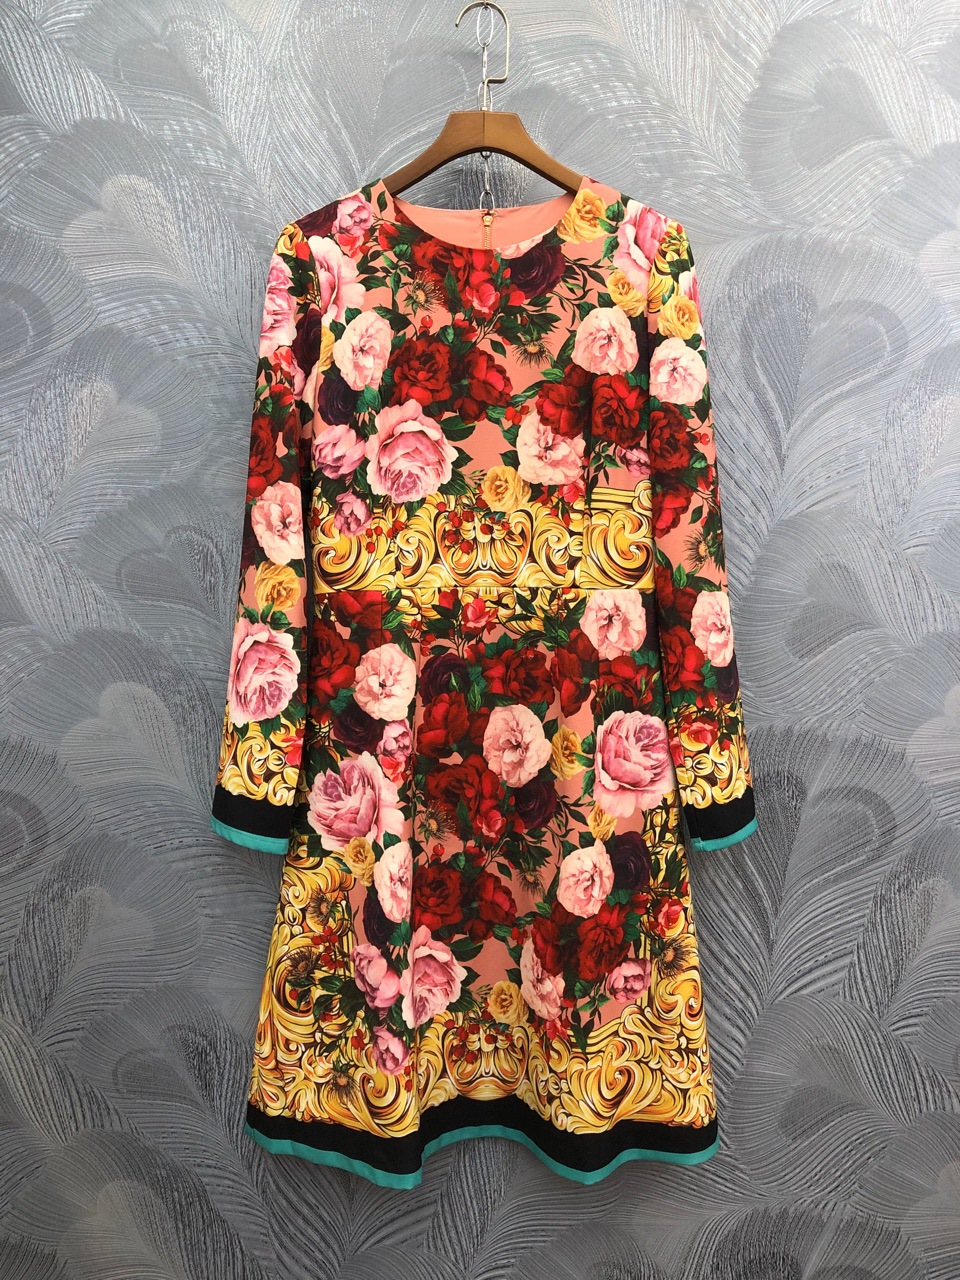 Chic women's floral print half sleeve dress 2020 spring summer runways elegant vintage dress B235